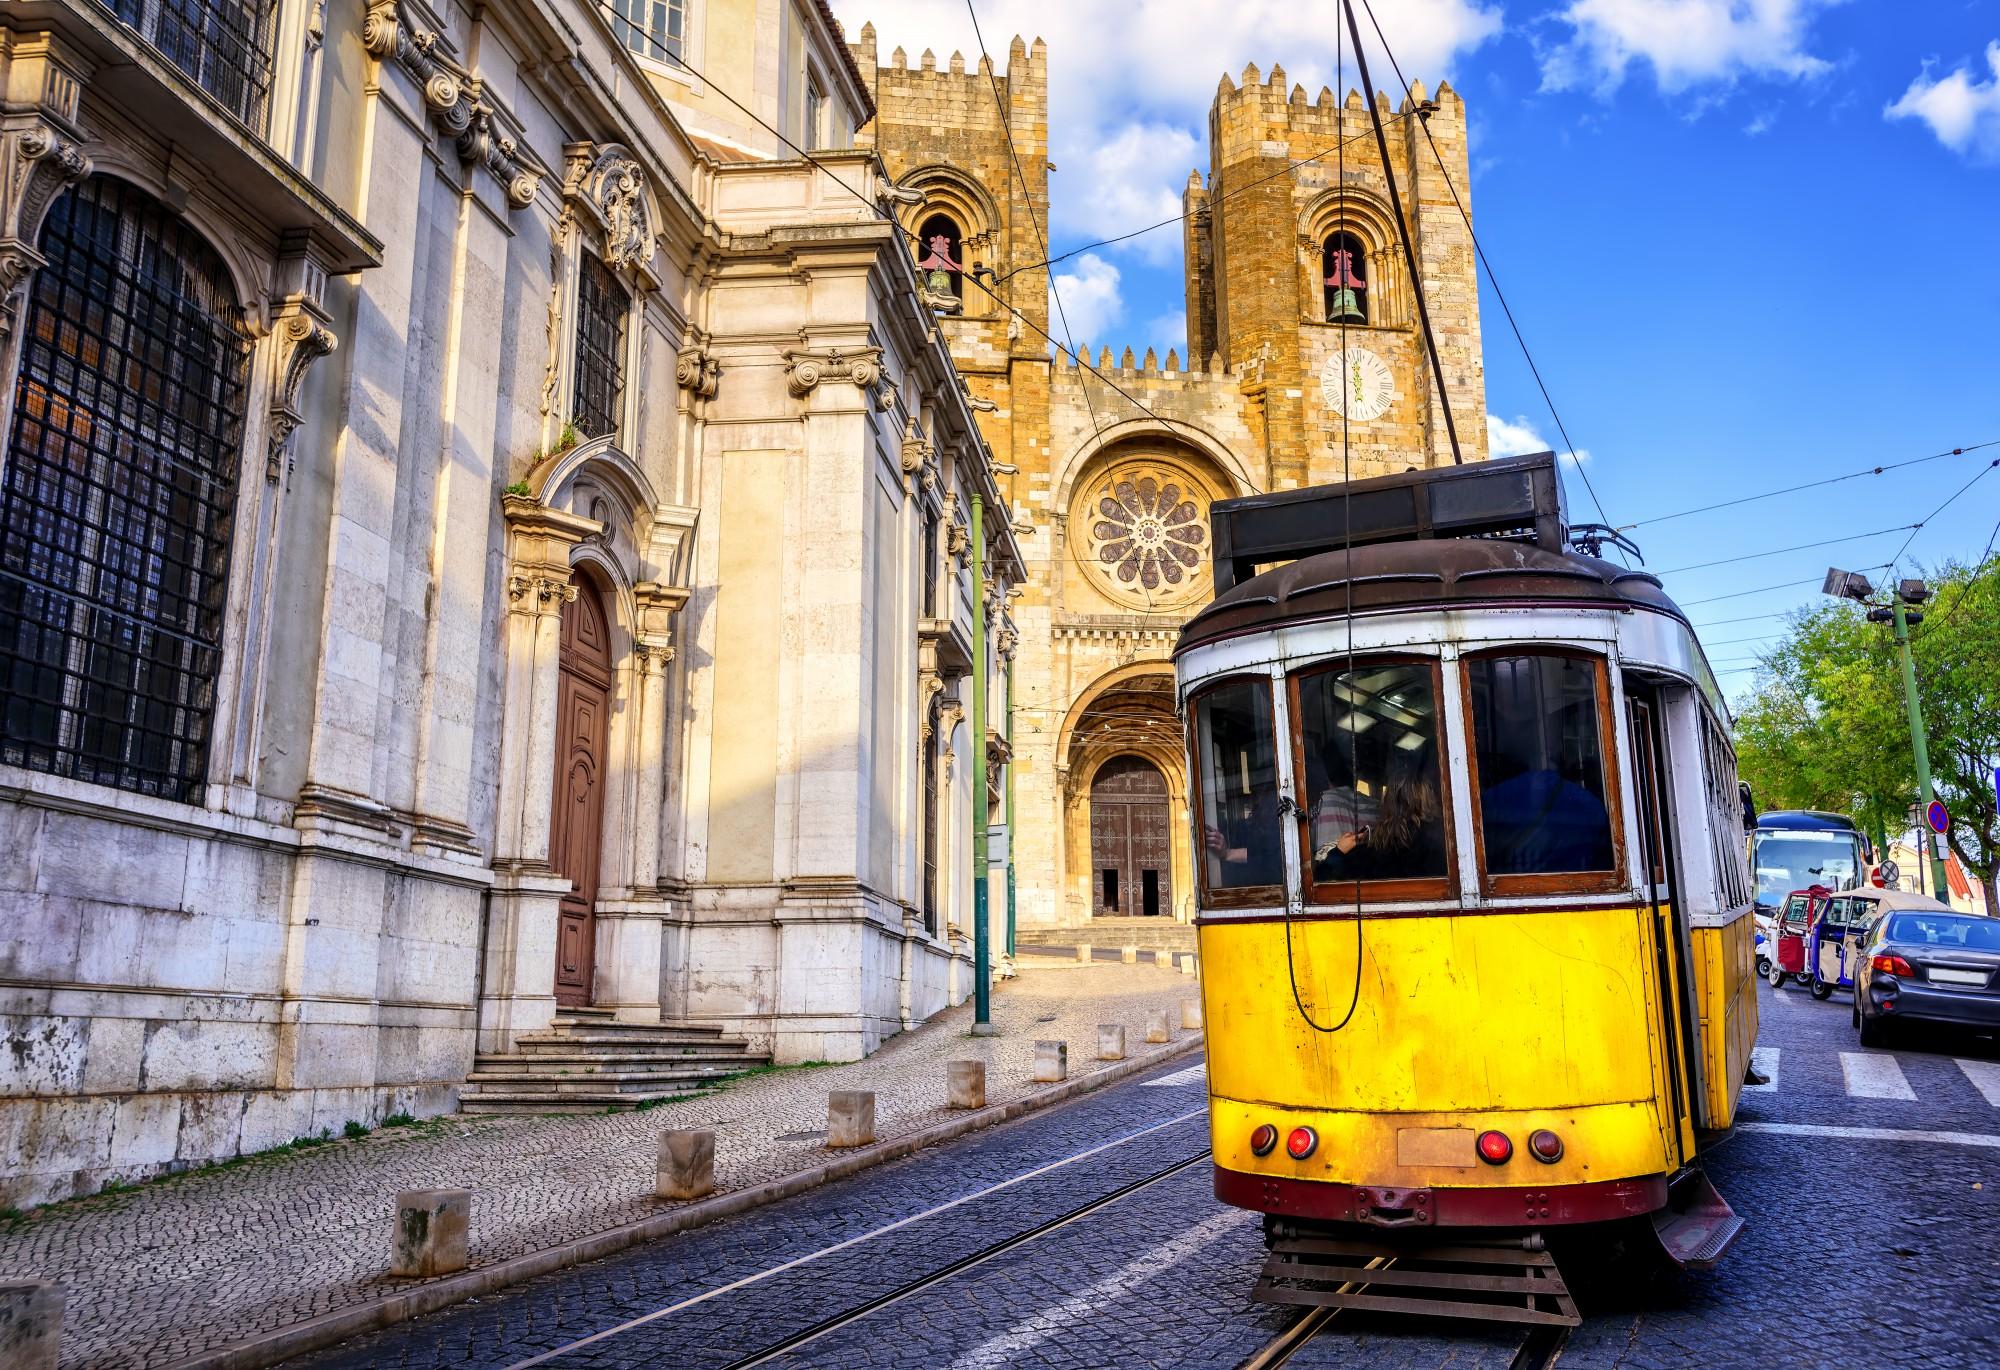 Ikonická žlutá tramvaj v Lisabonu